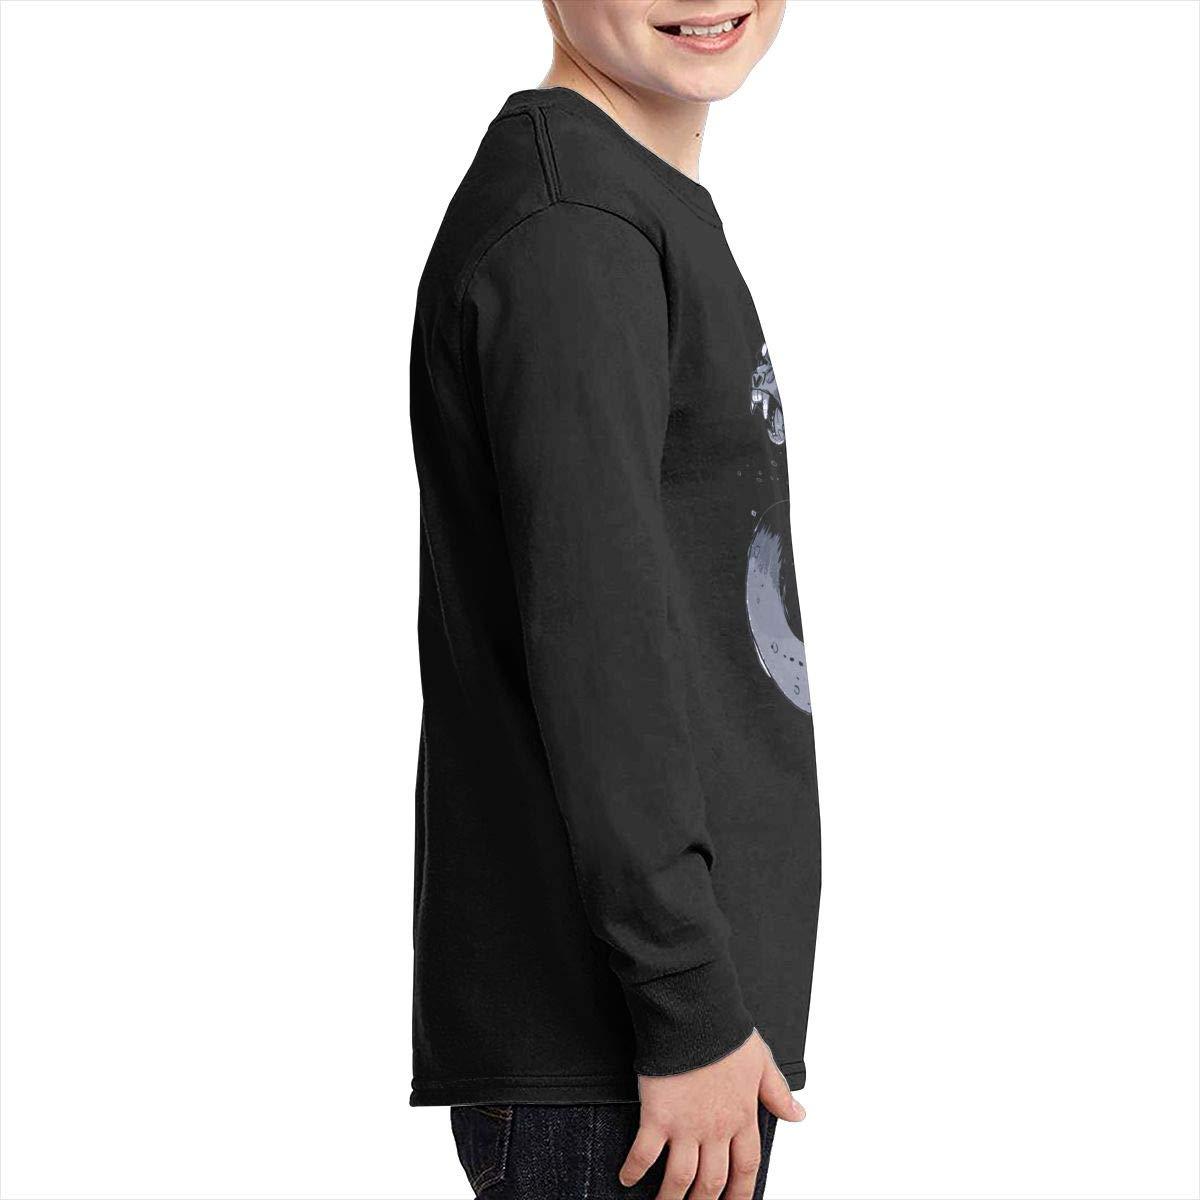 Optumus Demogorgon-Eleven-Stranger-Things Kids Sweatshirts Long Sleeve T Shirt Boy Girl Children Teenagers Unisex Tee